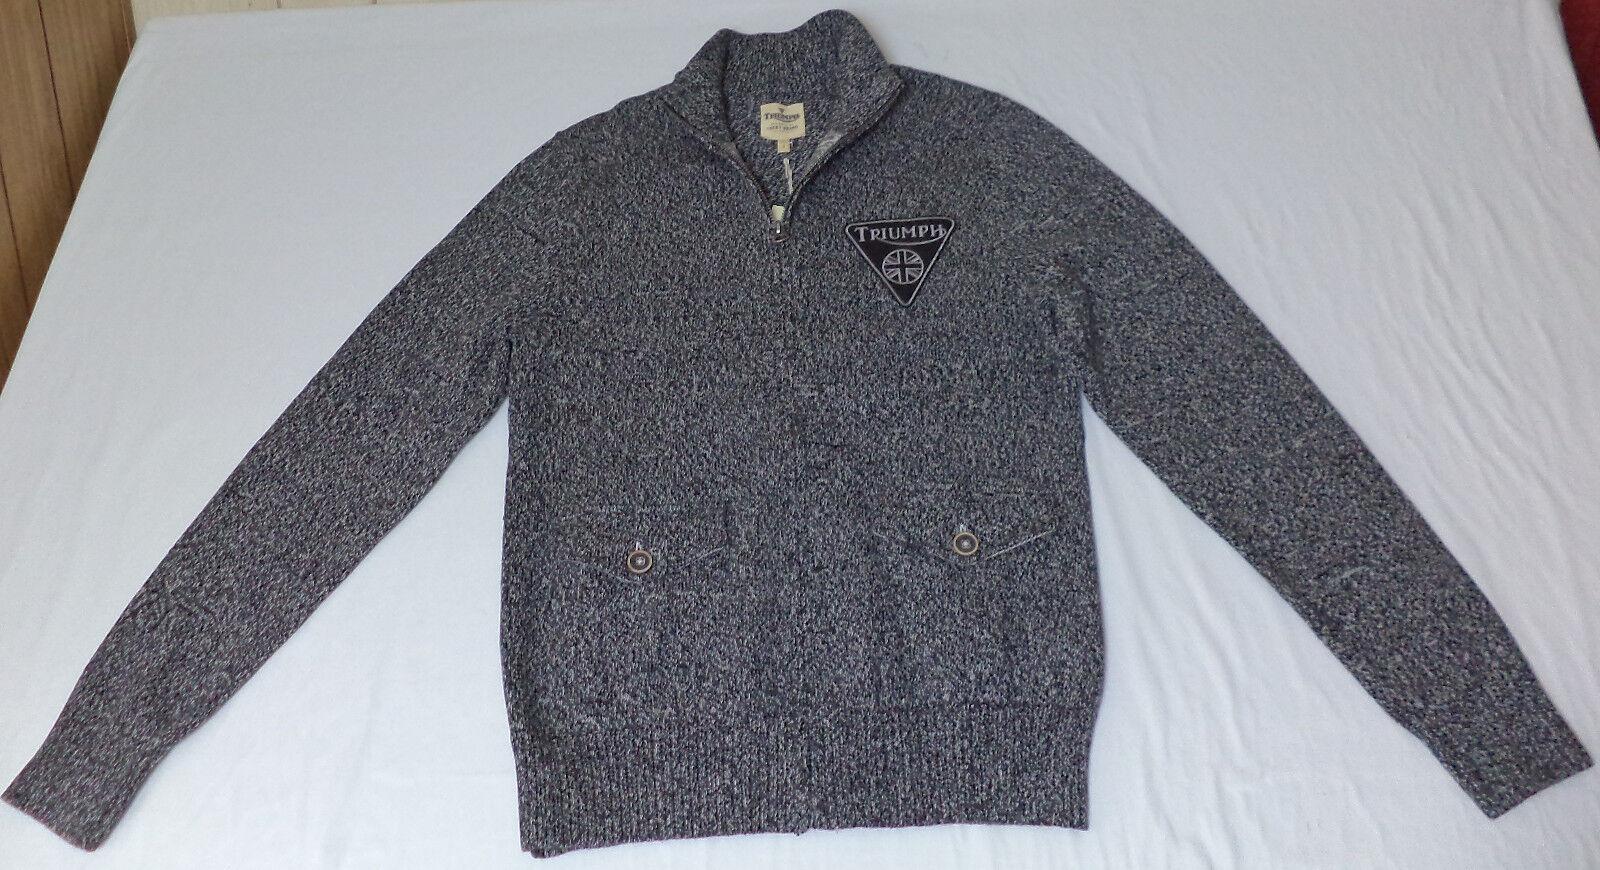 NWT Triumph Long Sleeve Multi-Farbeed Full Zipper Front Sweater   Medium   L1305